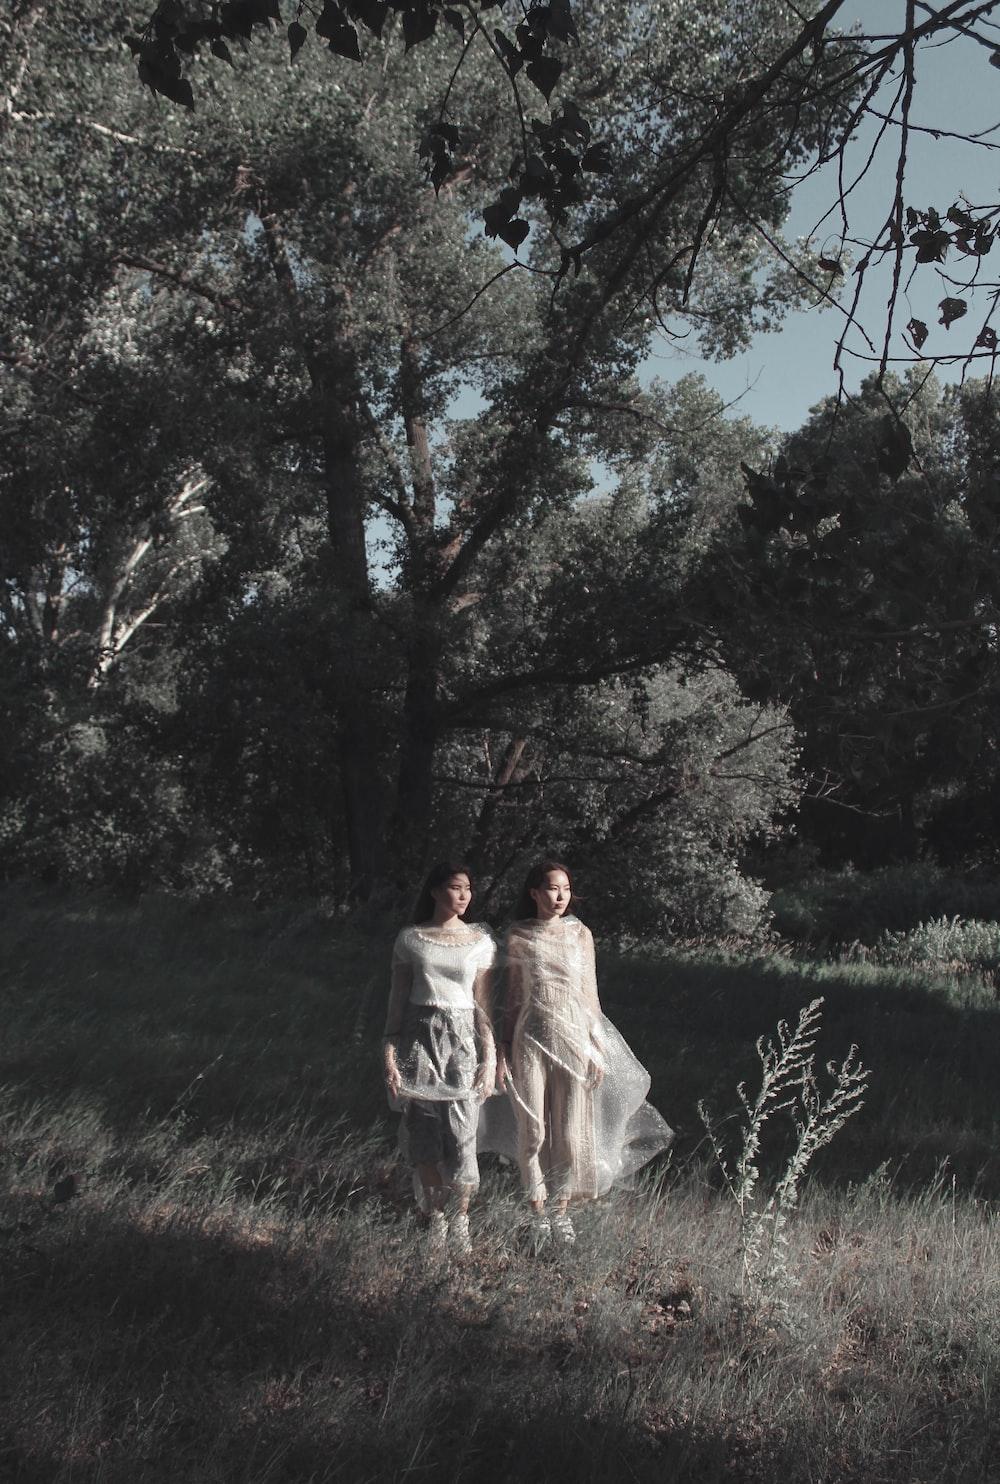 two women wearing white dress